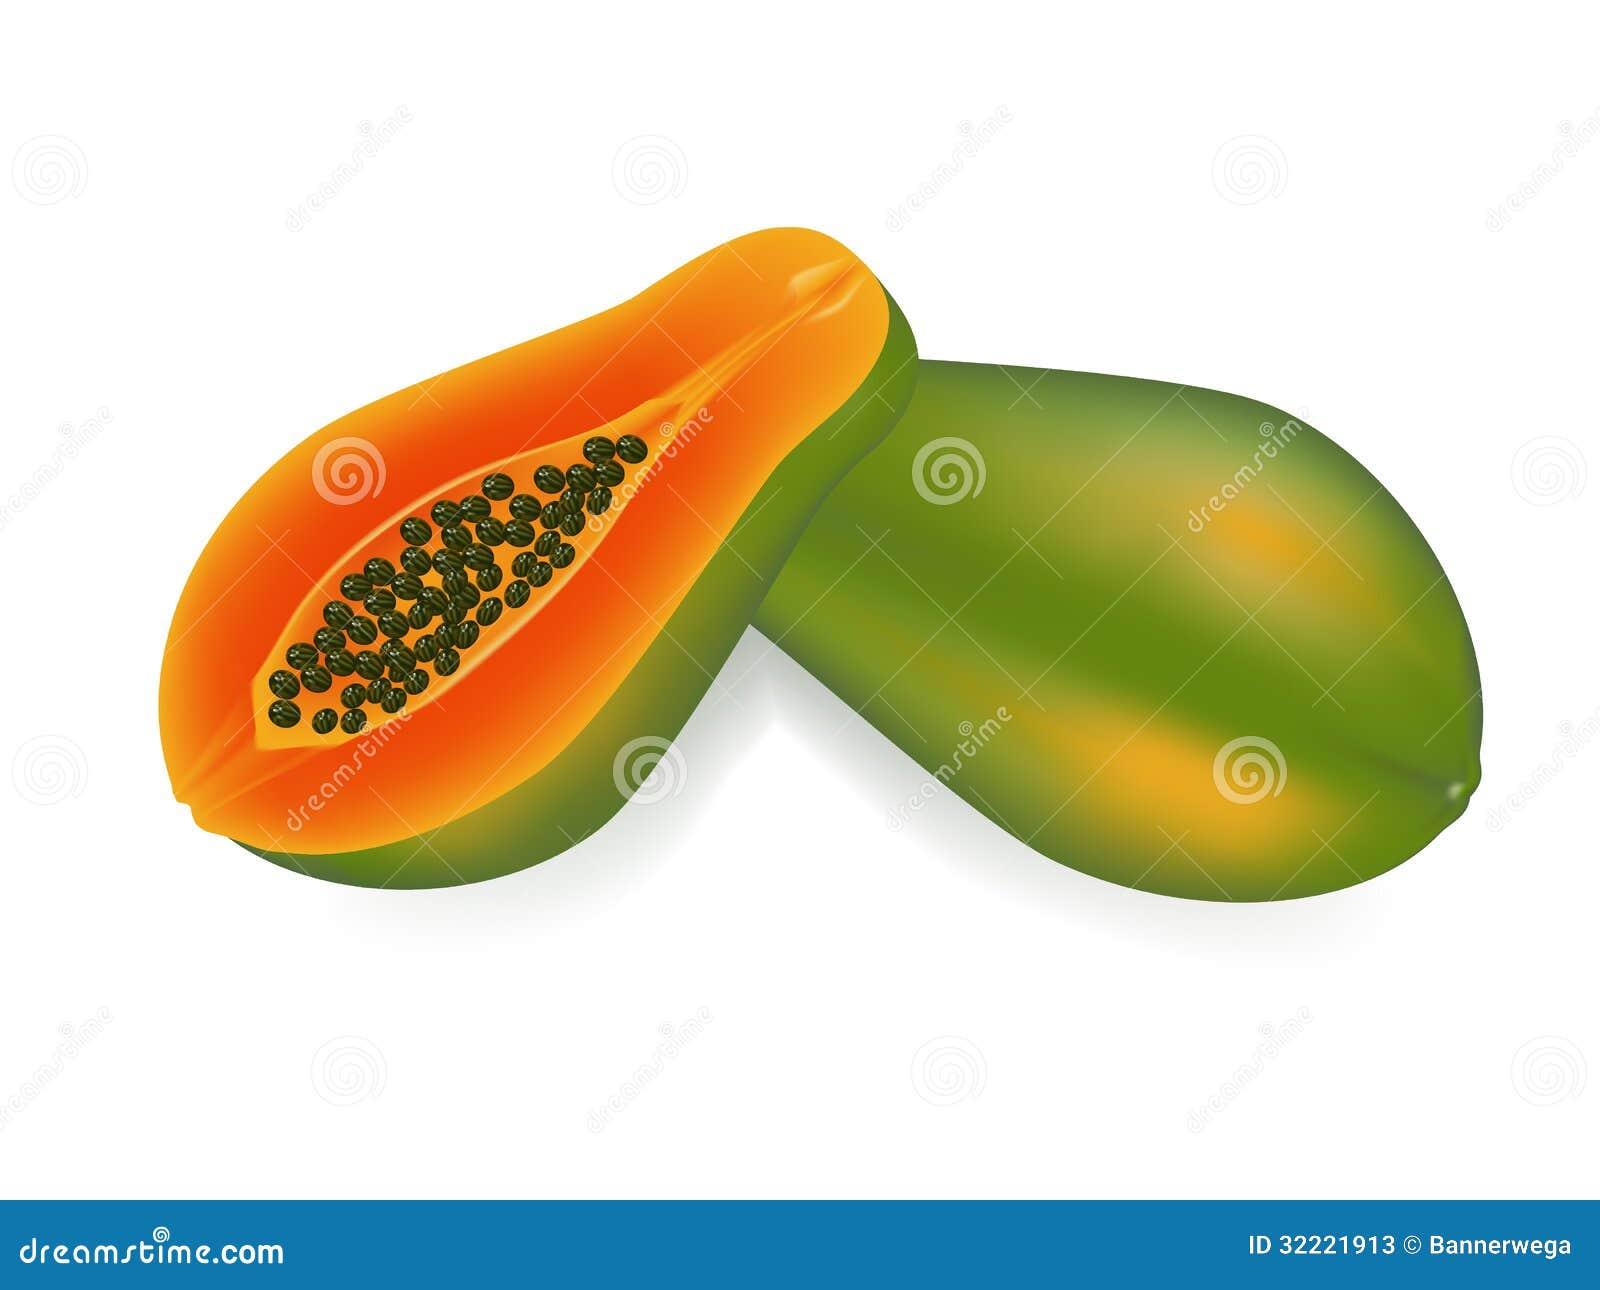 how to eat raw papaya